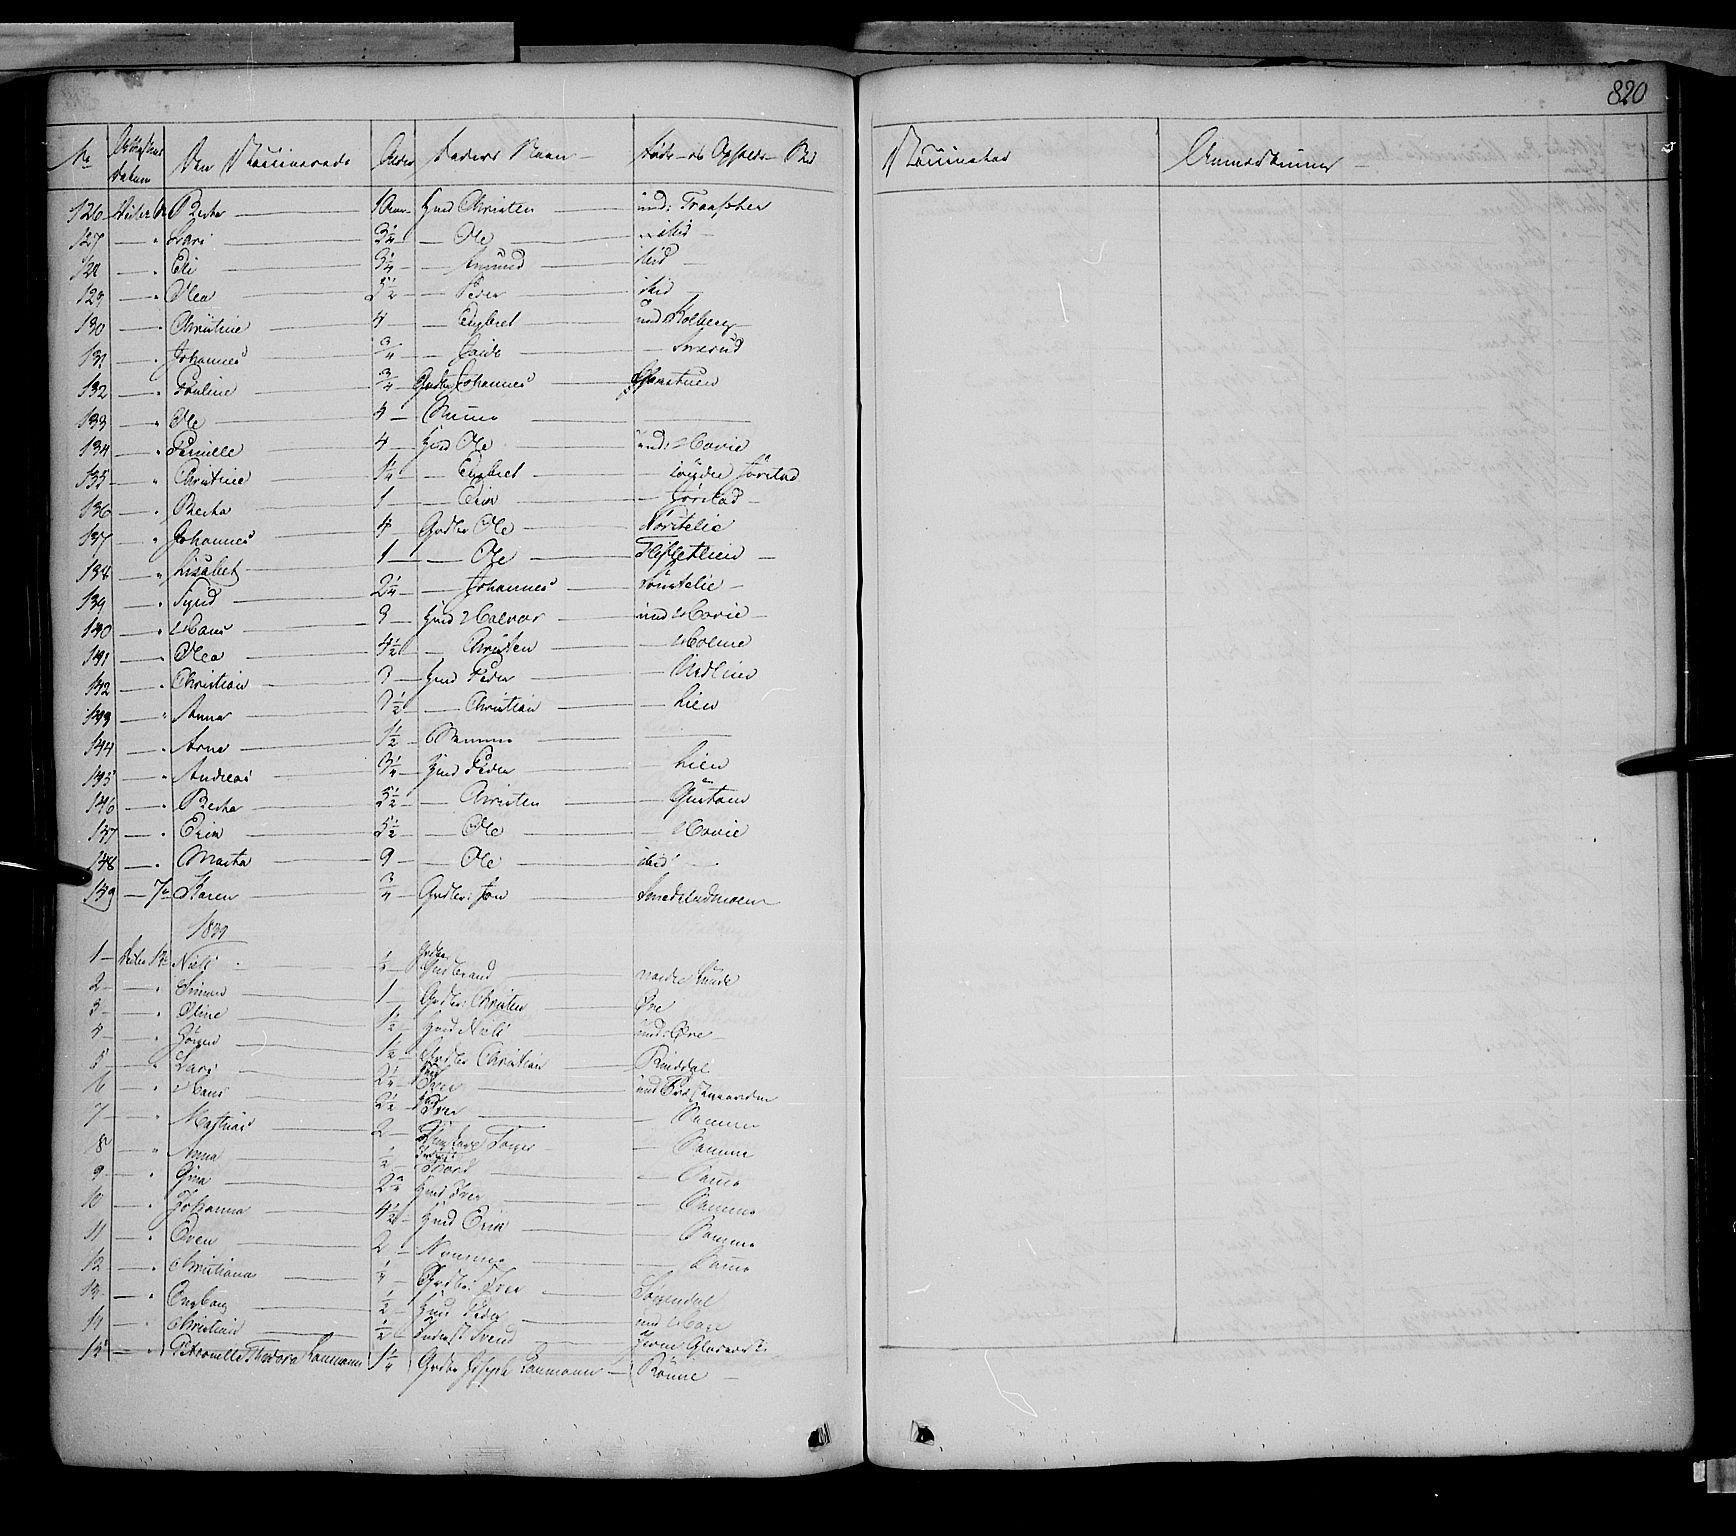 SAH, Fåberg prestekontor, Ministerialbok nr. 5, 1836-1854, s. 819-820